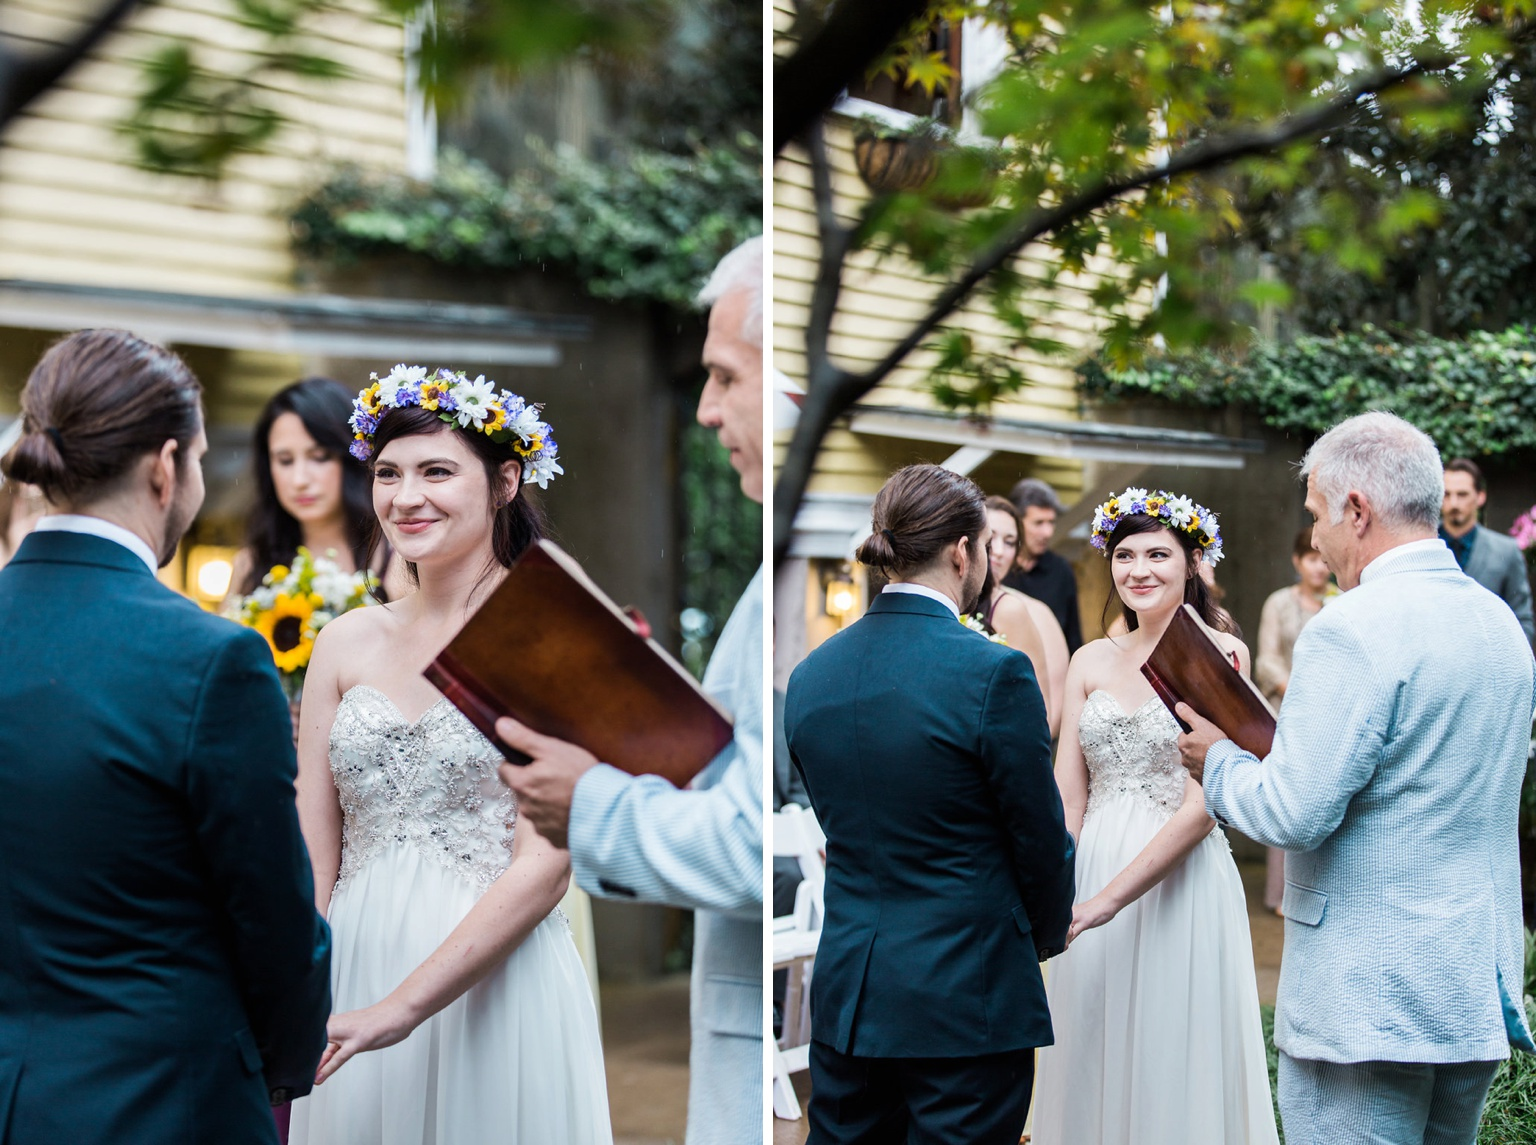 Apt_B_Photo_Savannah_Wedding_Photographer_Flower_Crown026.JPG